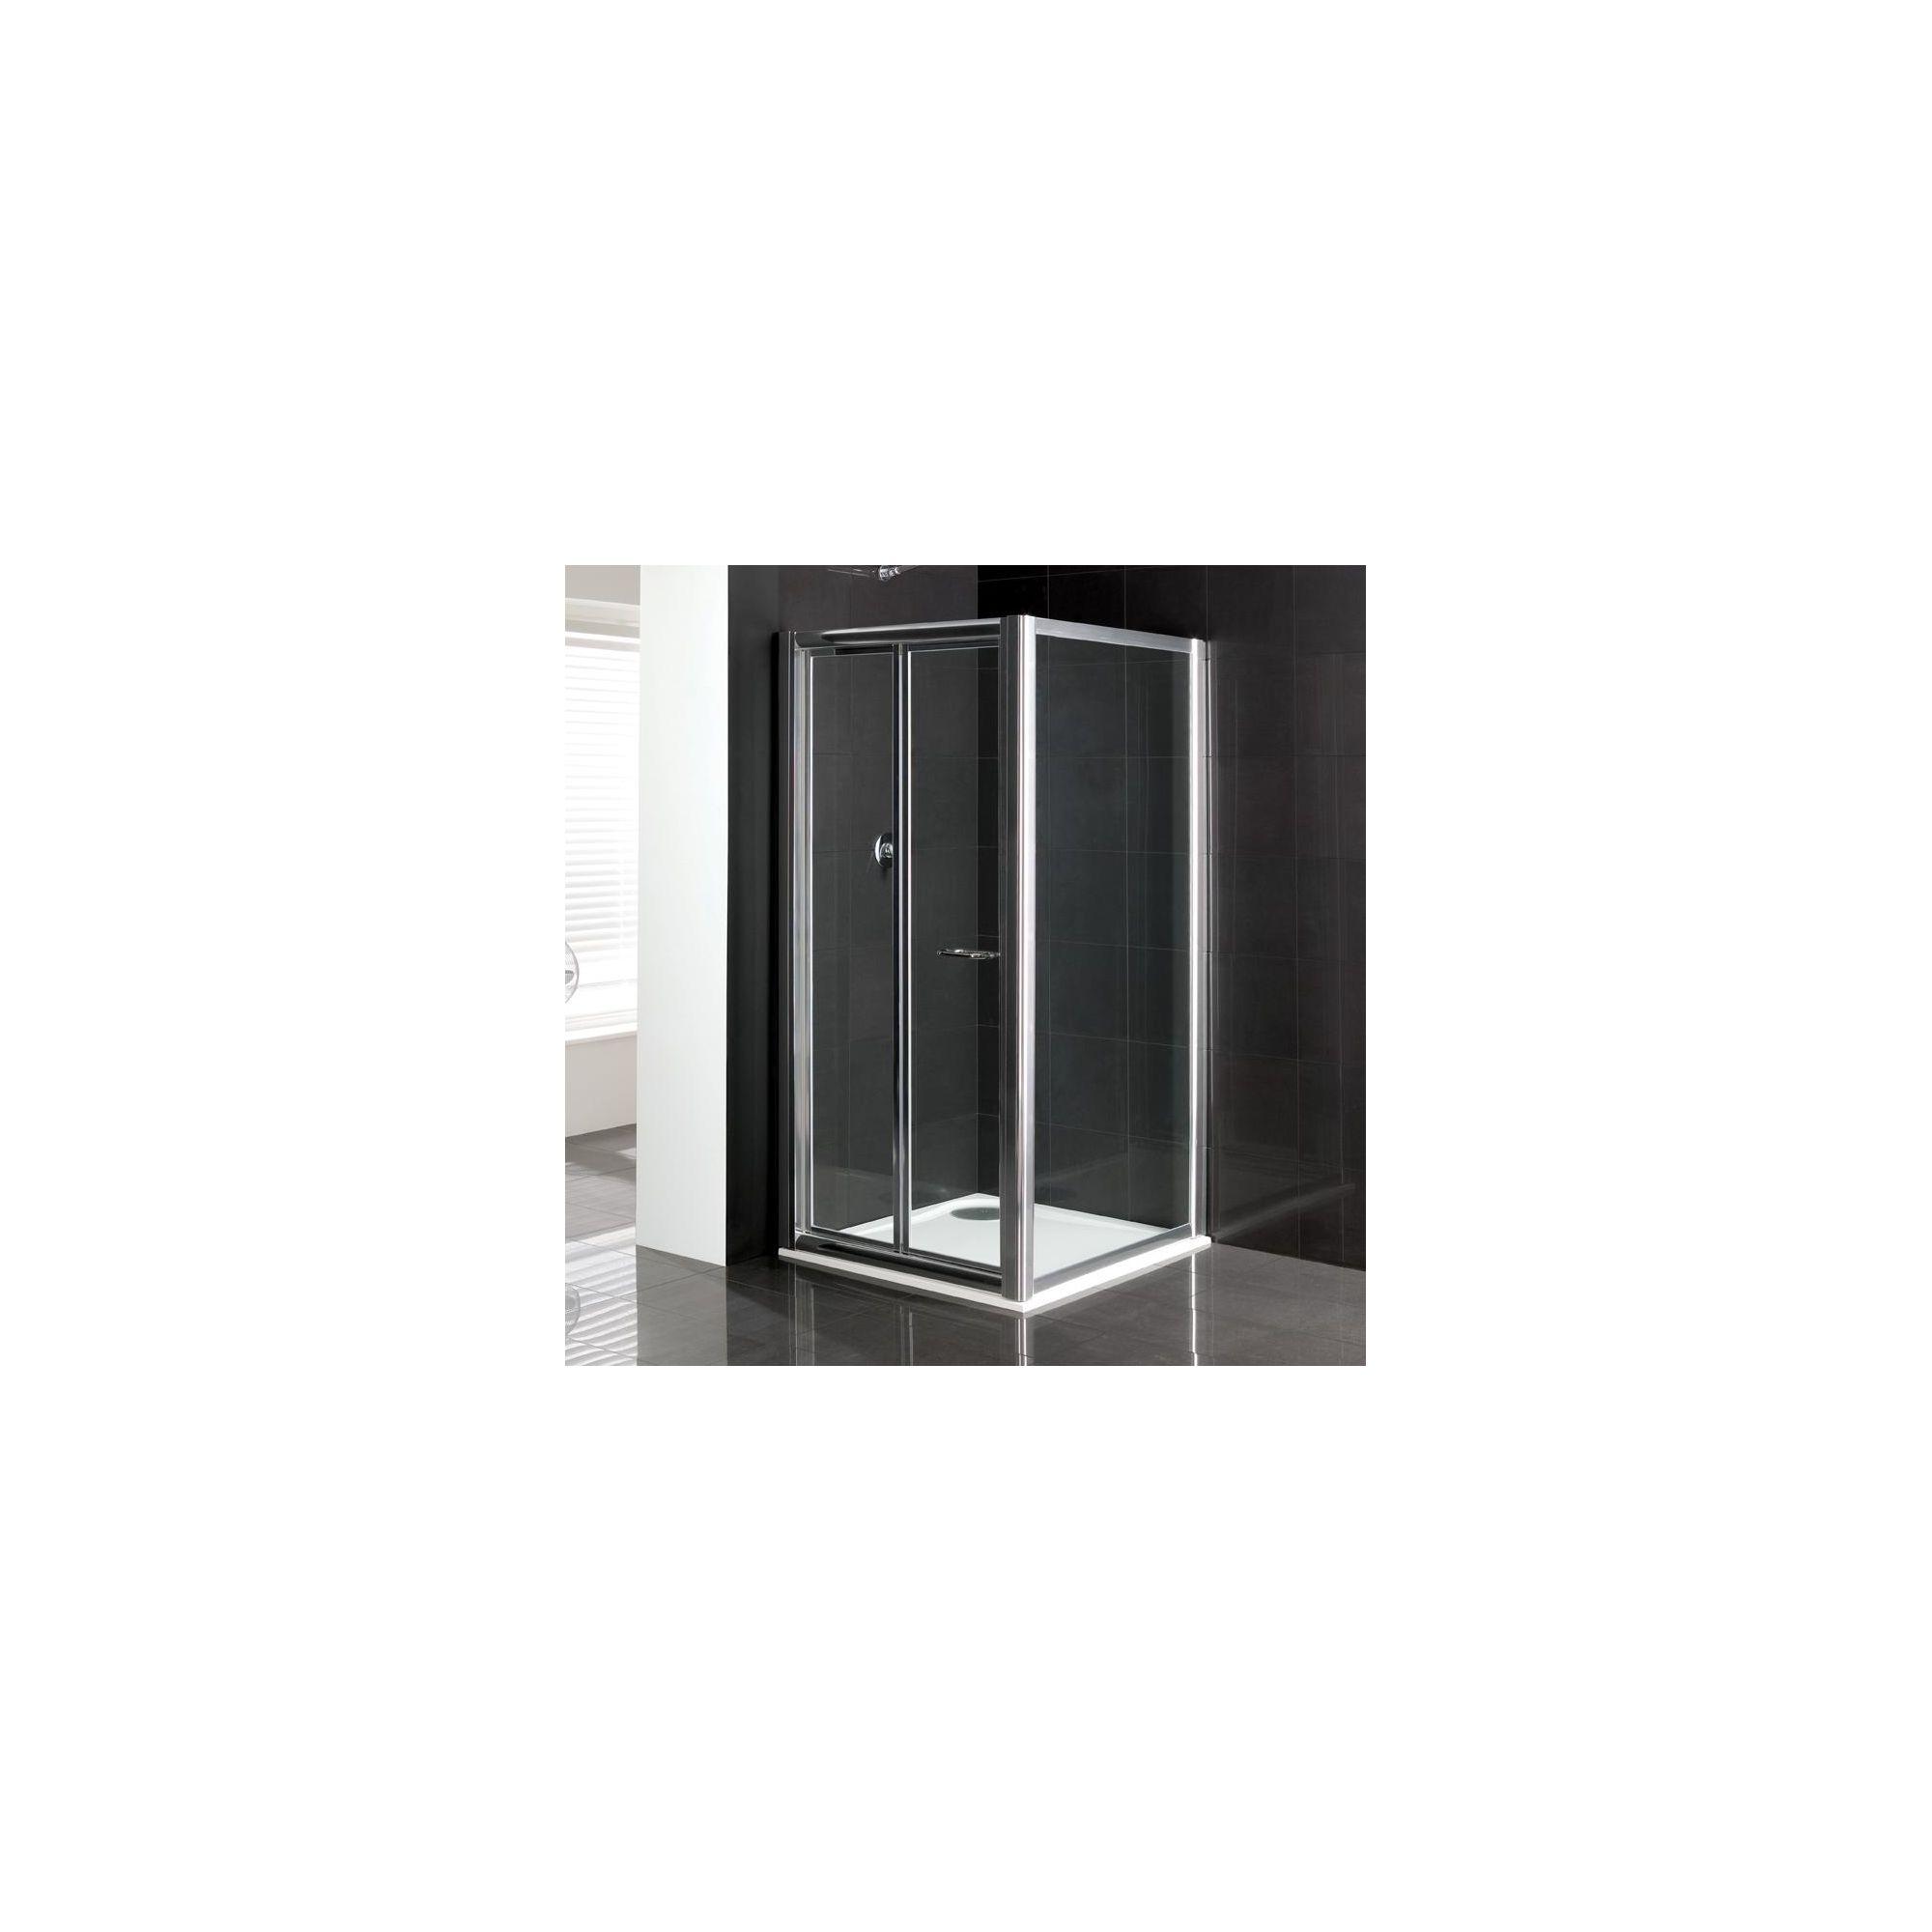 Duchy Elite Silver Bi-Fold Door Shower Enclosure with Towel Rail, 900mm x 700mm, Standard Tray, 6mm Glass at Tesco Direct